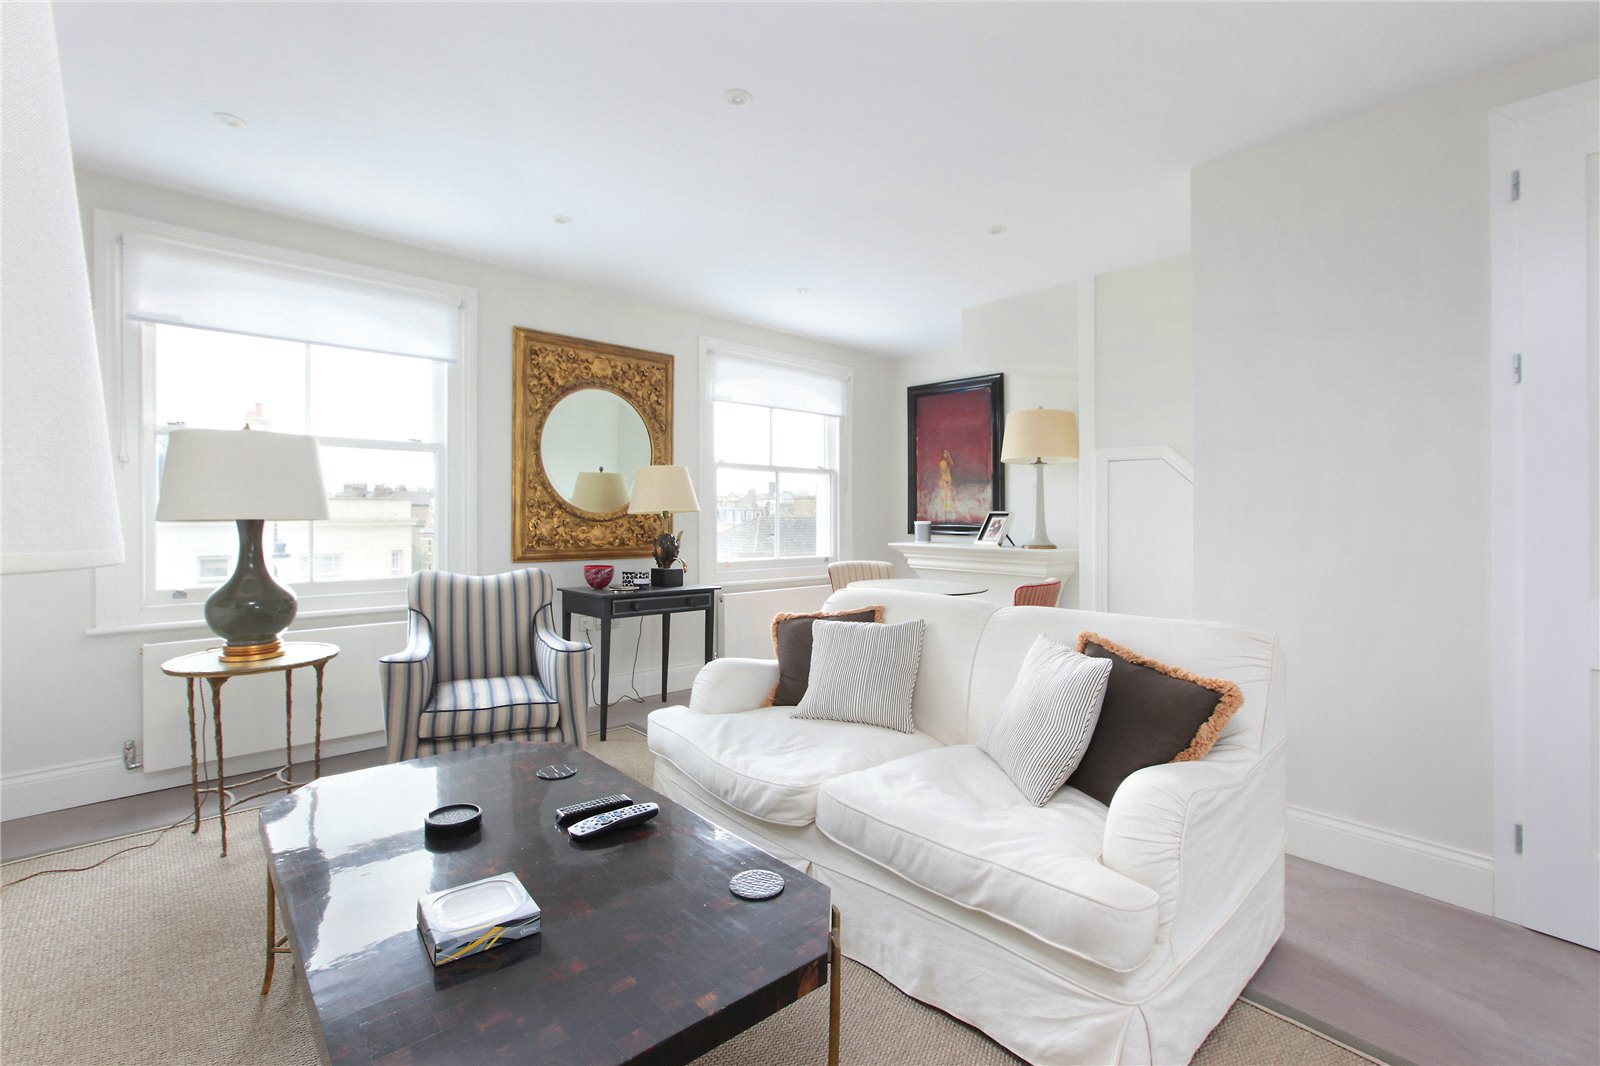 2 Bedrooms Flat for sale in St John's Hill, London, SW11